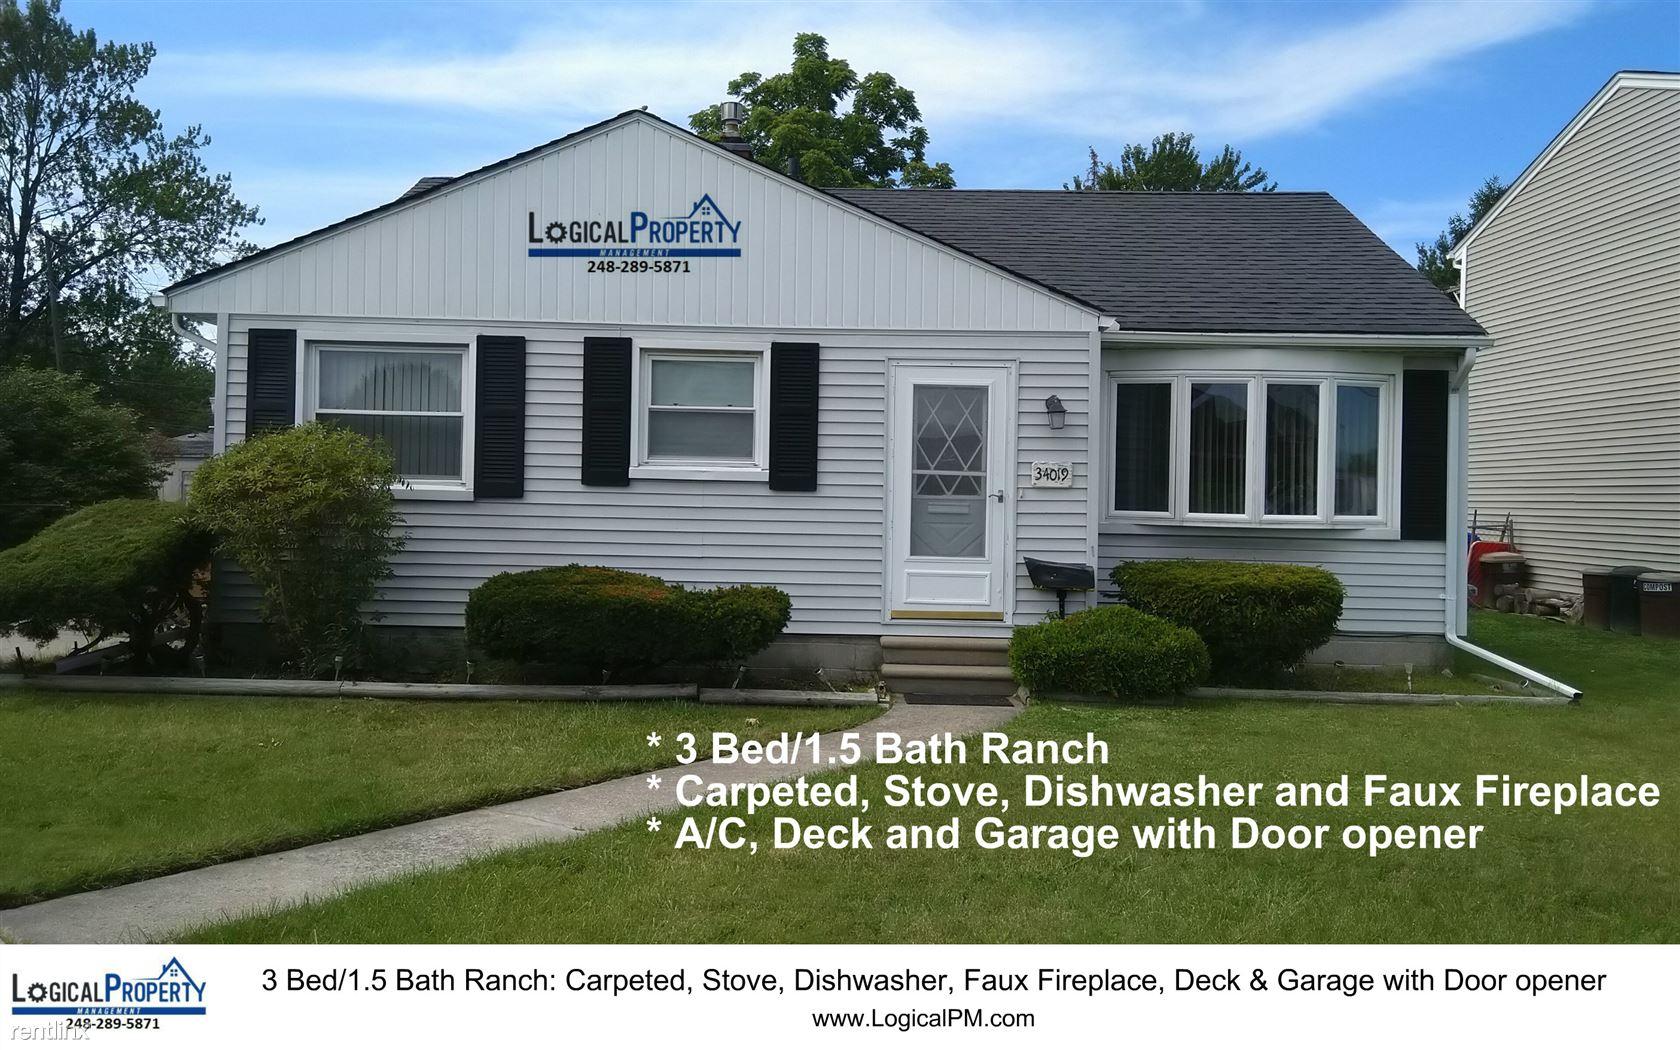 34019 Garfield Rd, Fraser, MI - $1,250